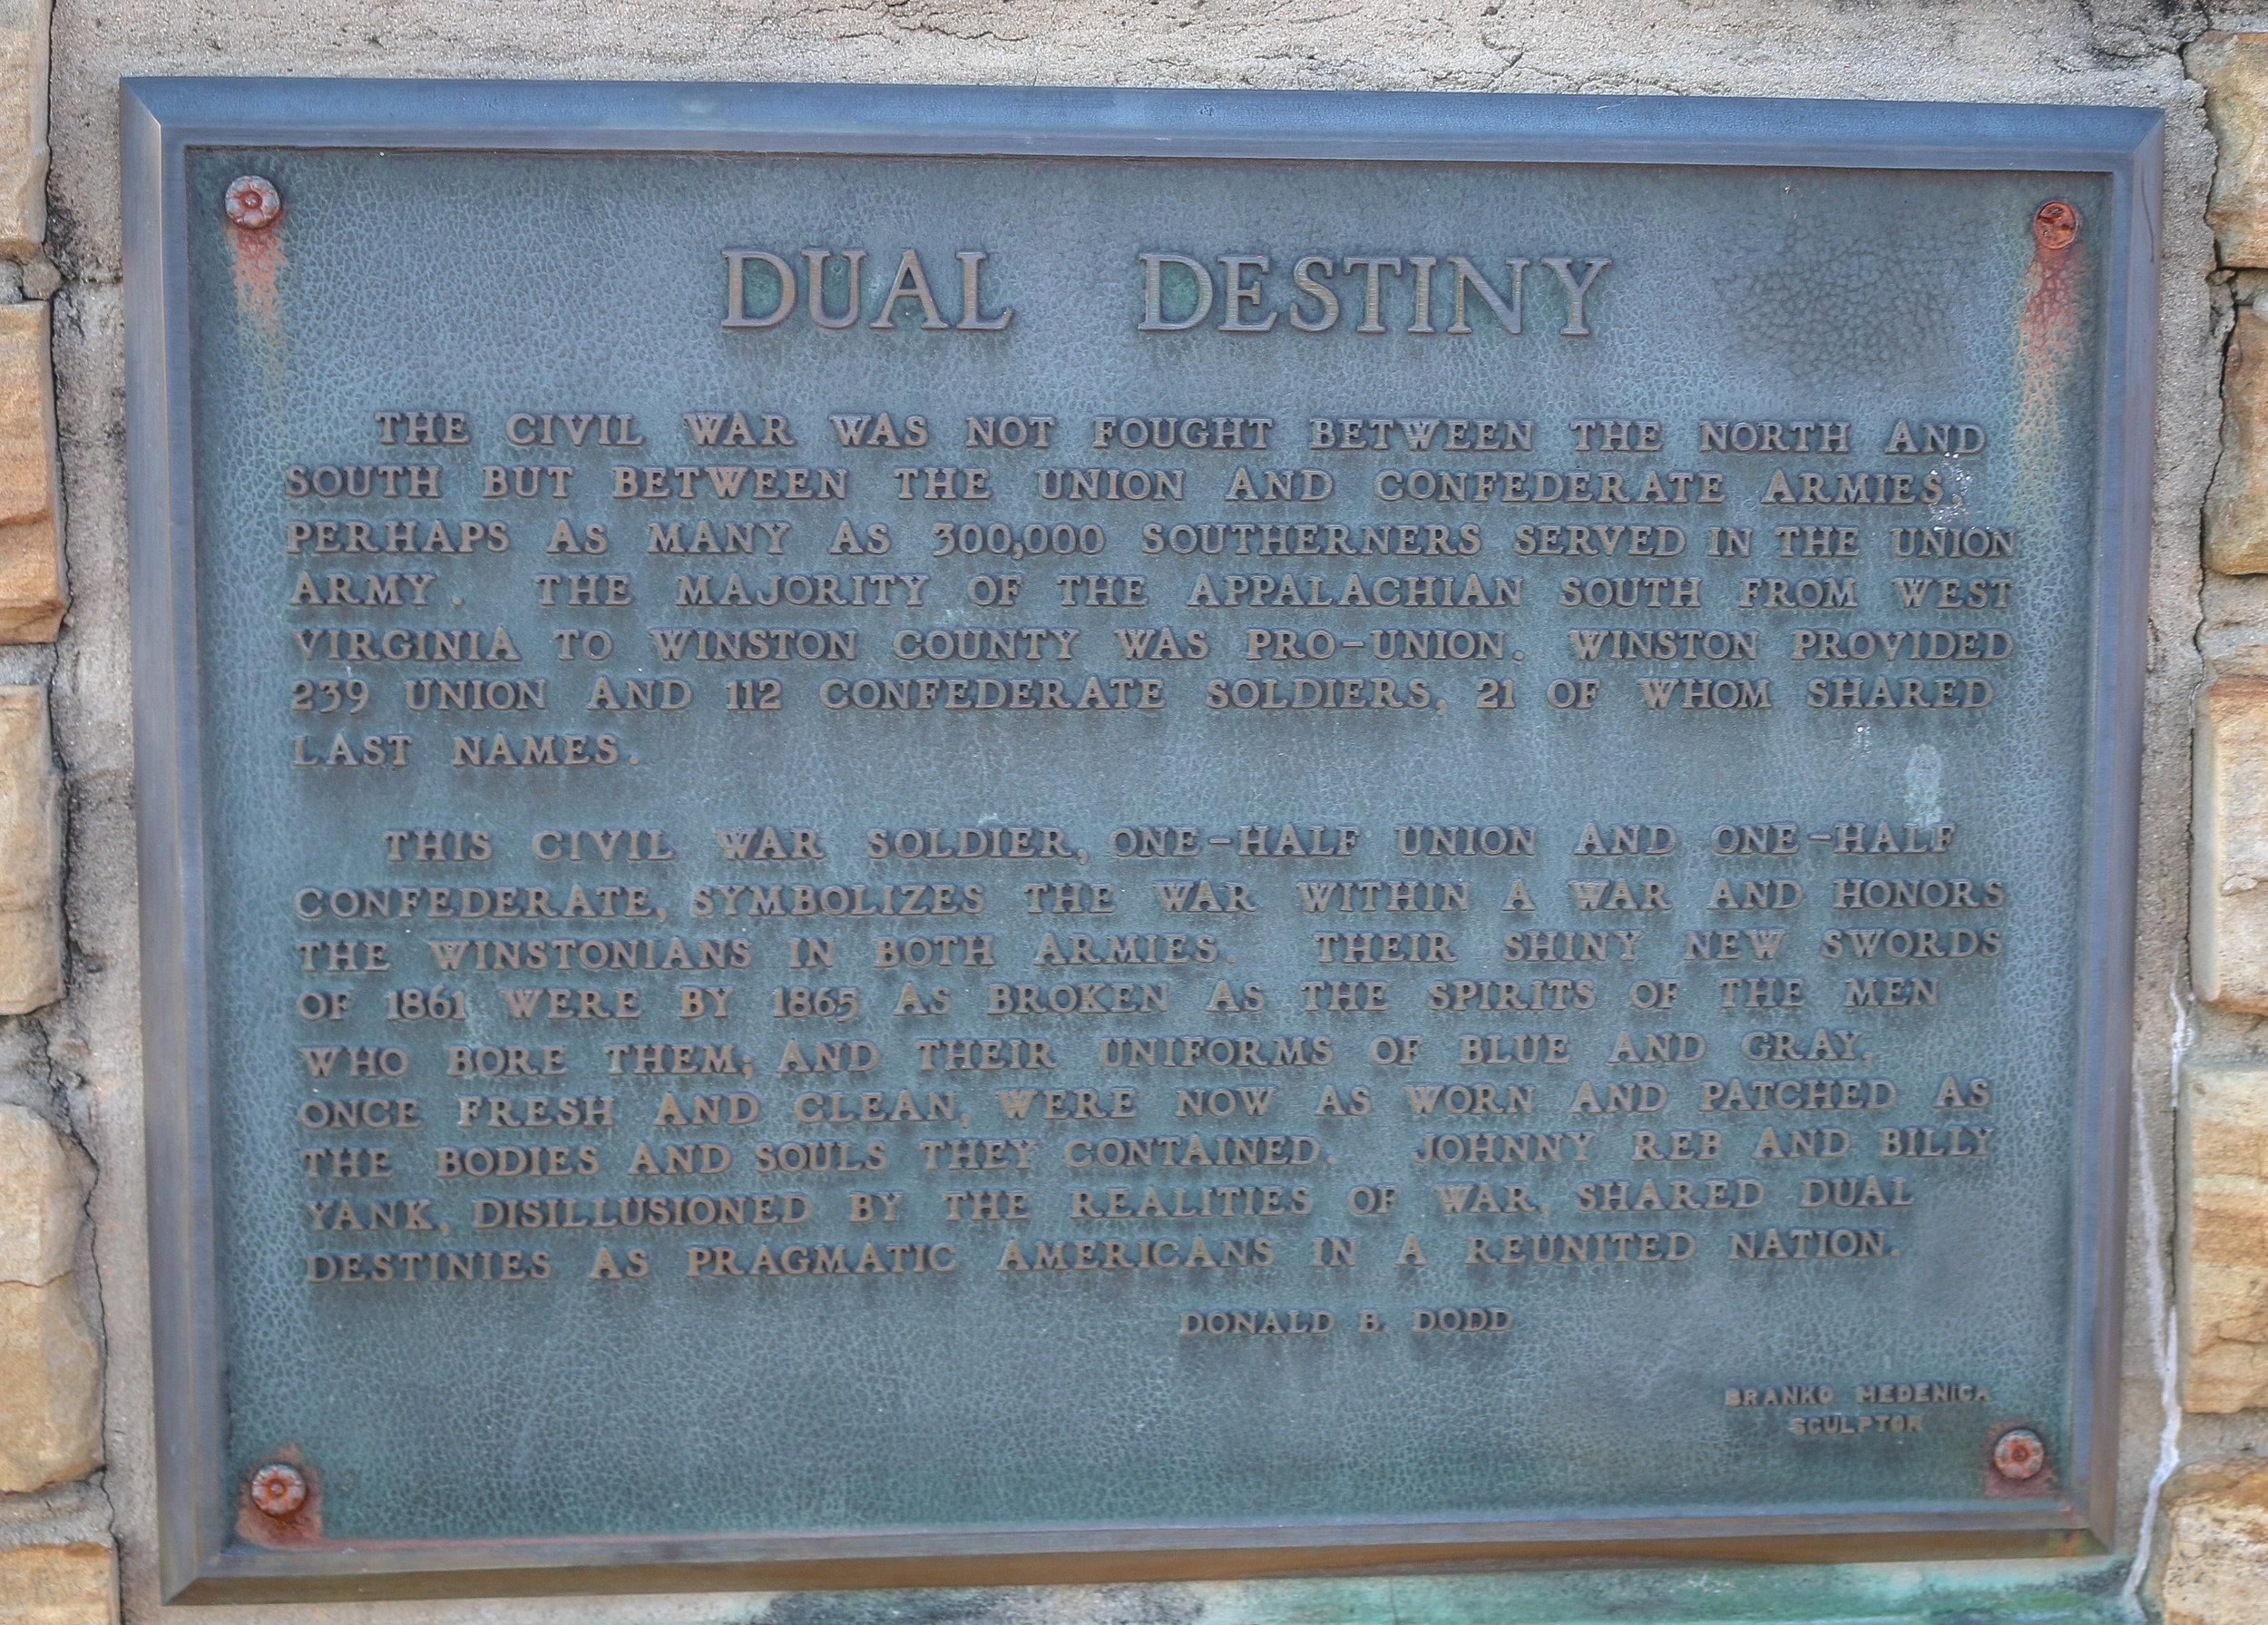 Dual Destinies Free State of Winston Plaque Alabama